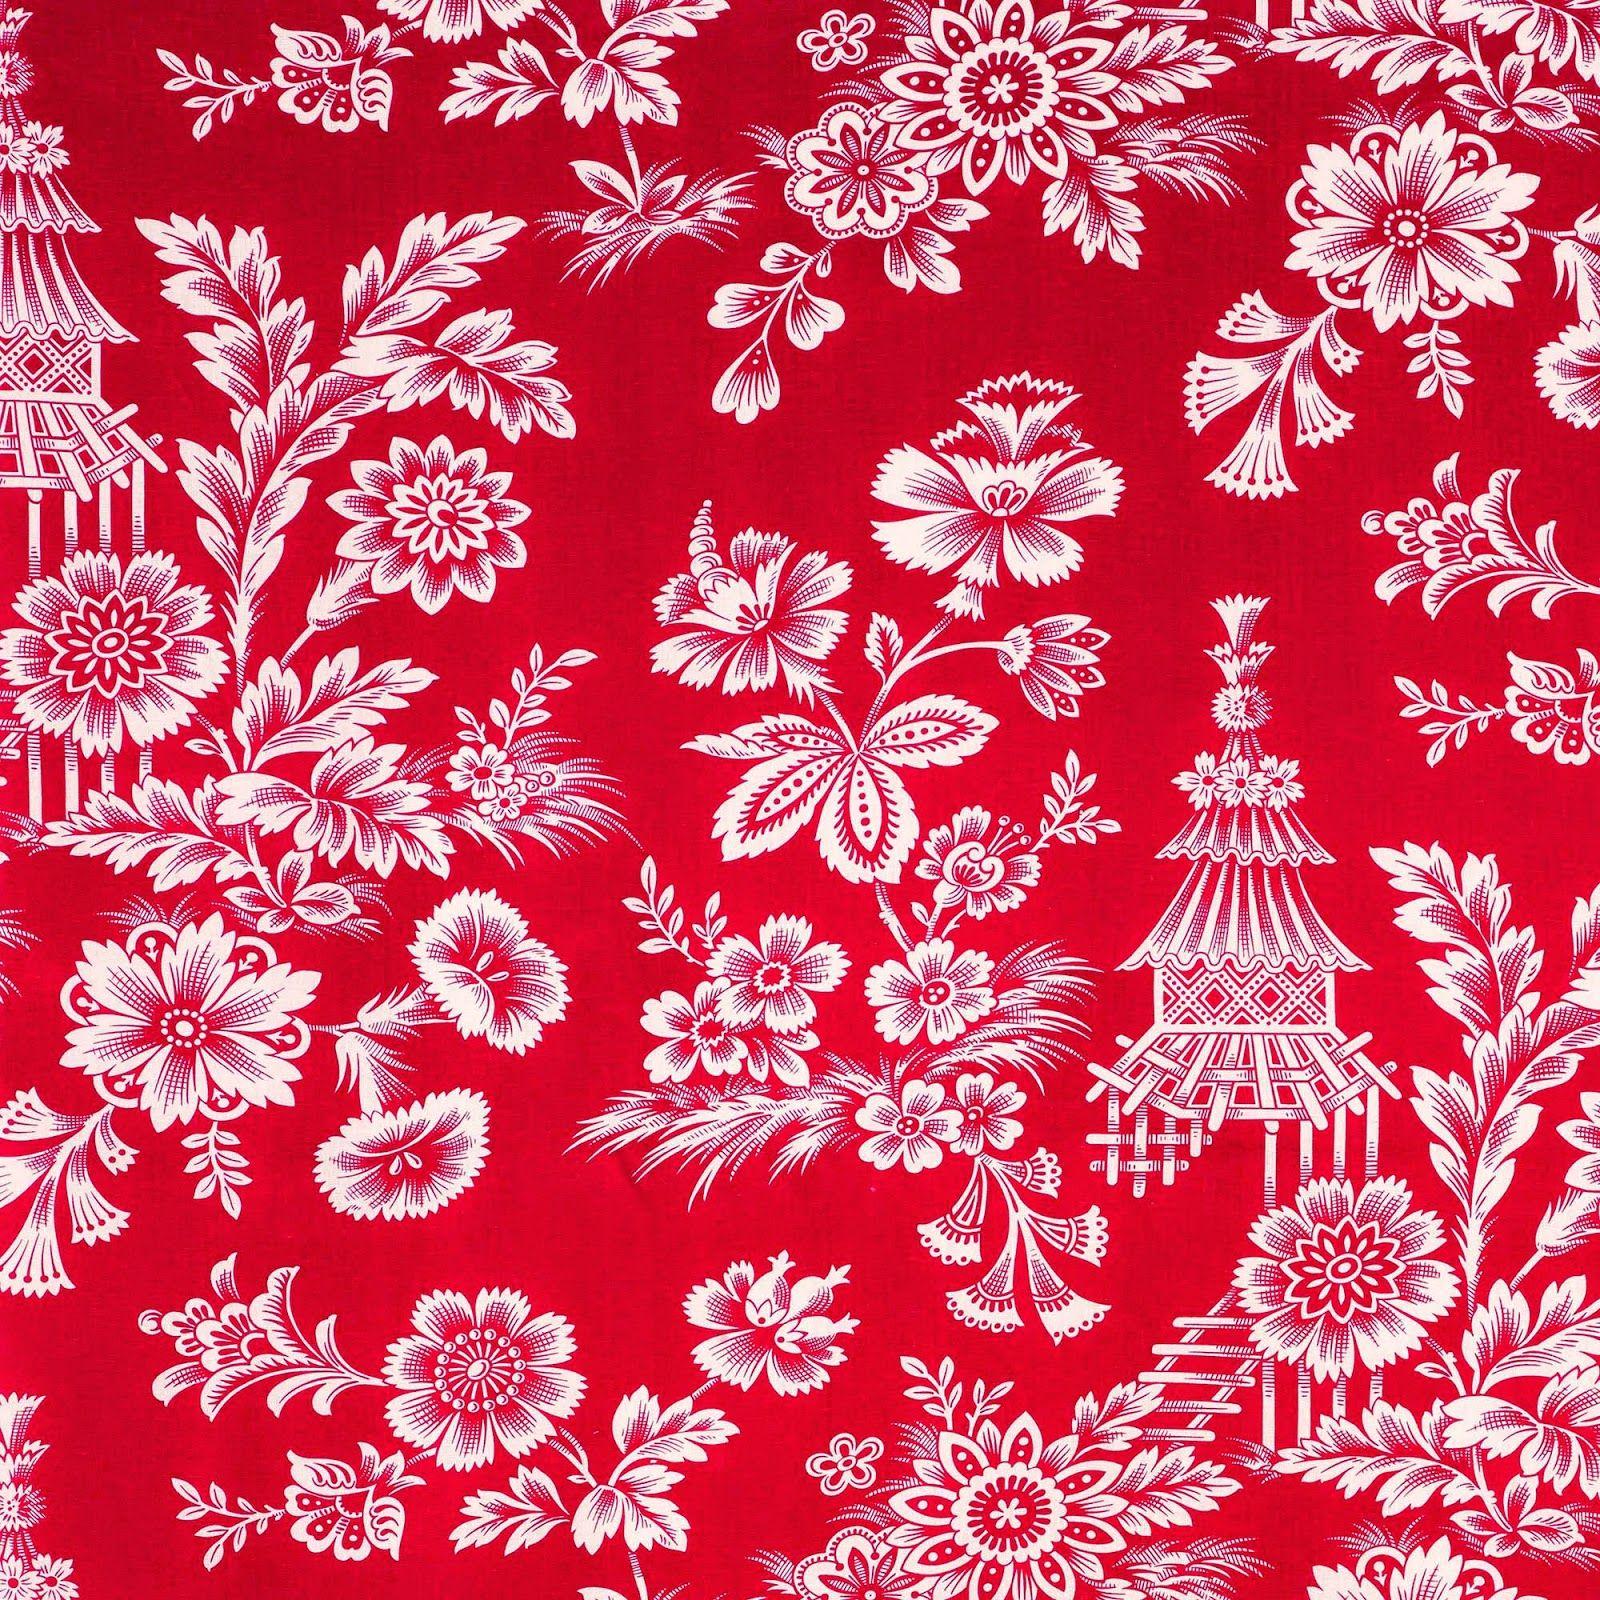 Schumacher Floral Prints, a Perennial Favorite